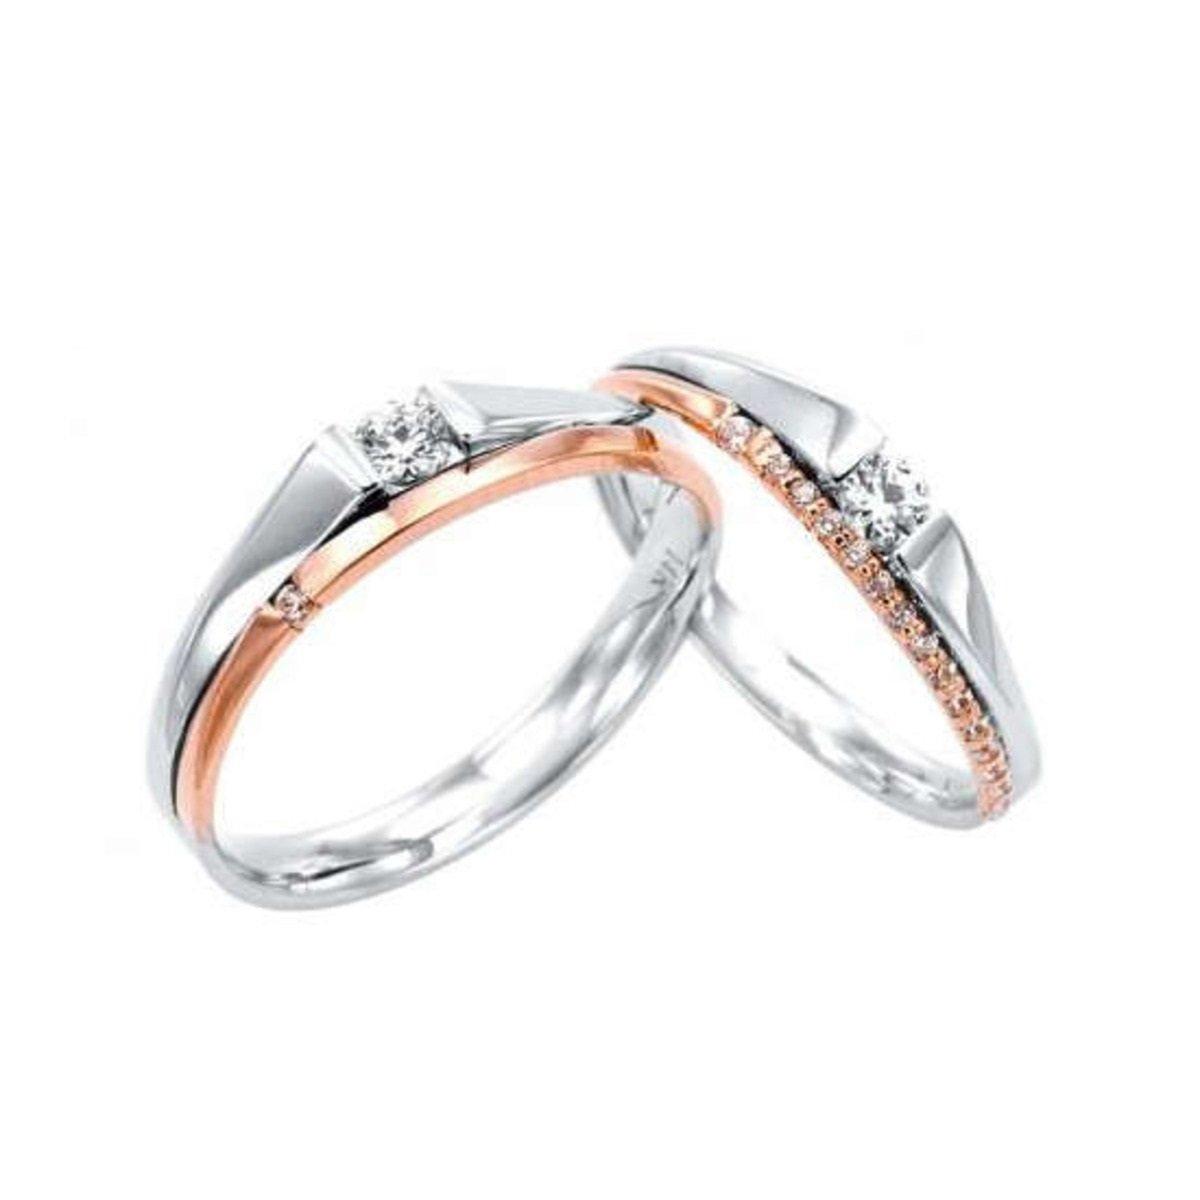 14K 拼玫瑰金鑲石情侶戒指 (女款)